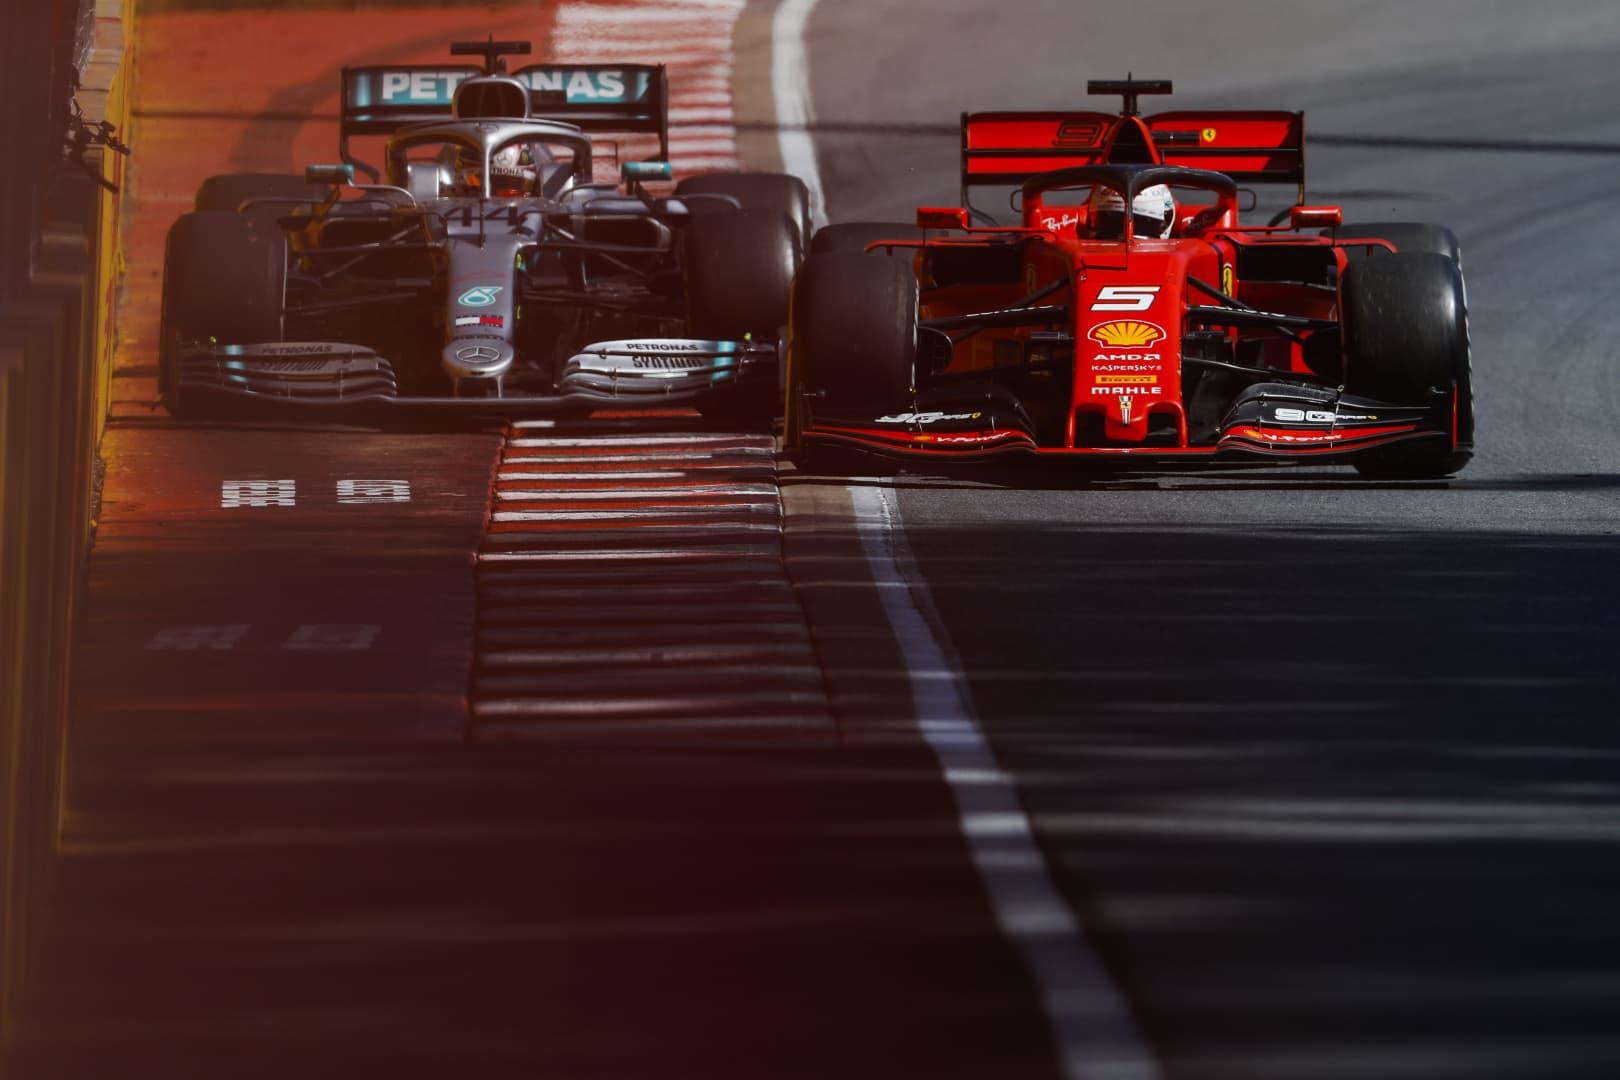 2019 Canadian Grand Prix, Sunday